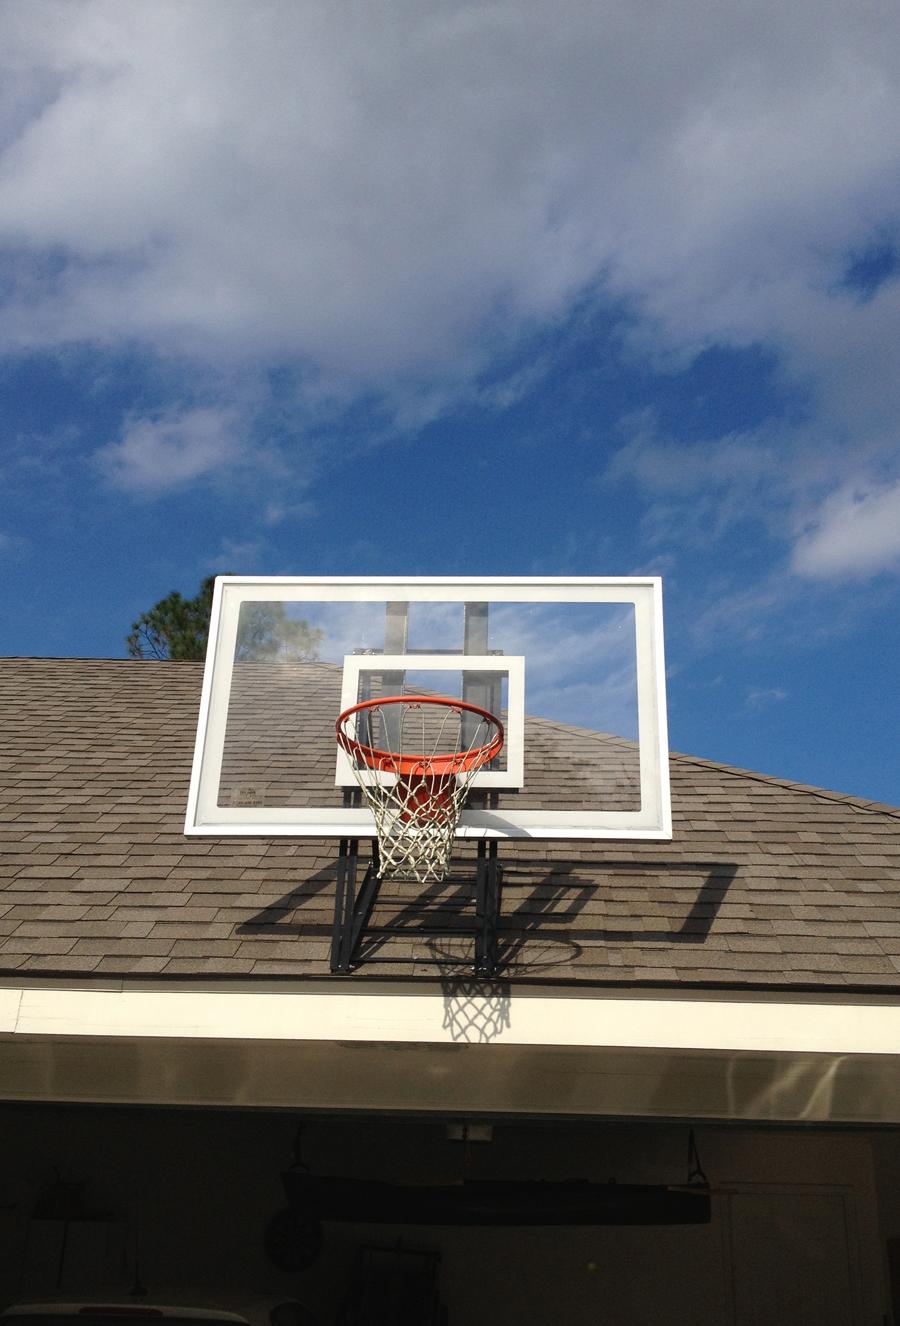 Roof King Platinum Basketball System